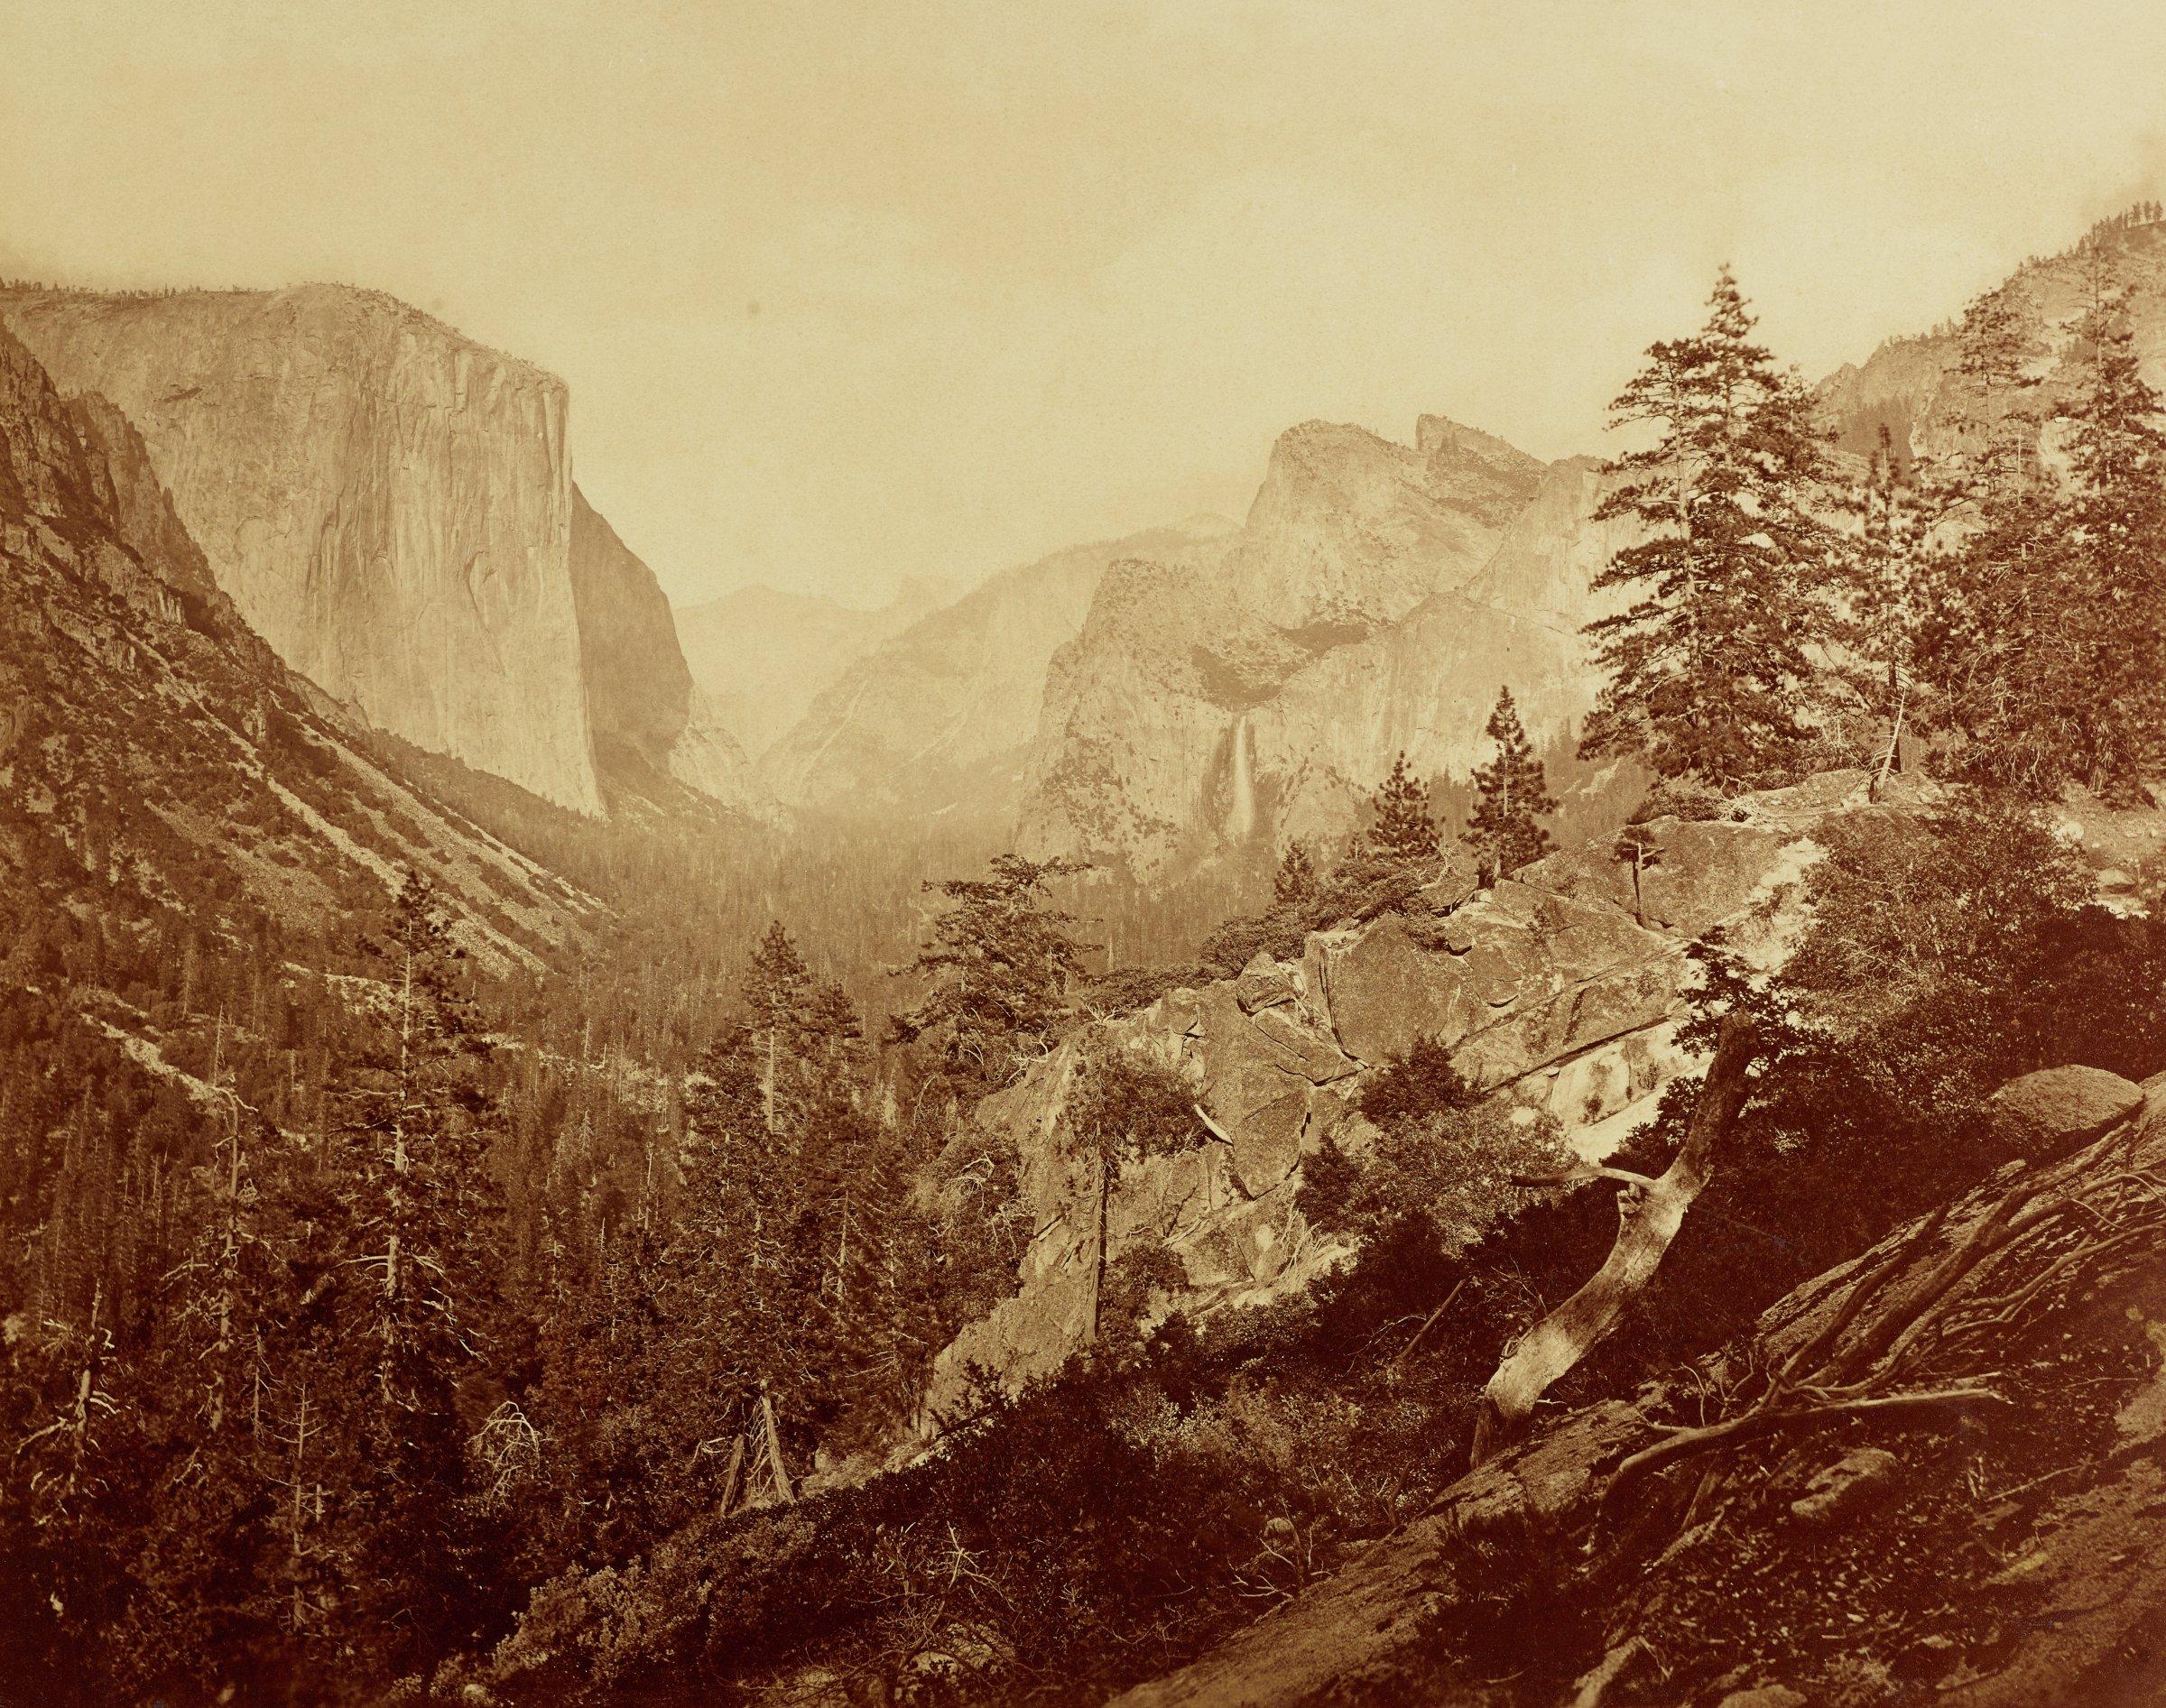 Valley of the Yosemite from Moonlight Rock, Eadwaerd Muybridge, mammoth-plate albumen print on original Bradley & Rulofson mount